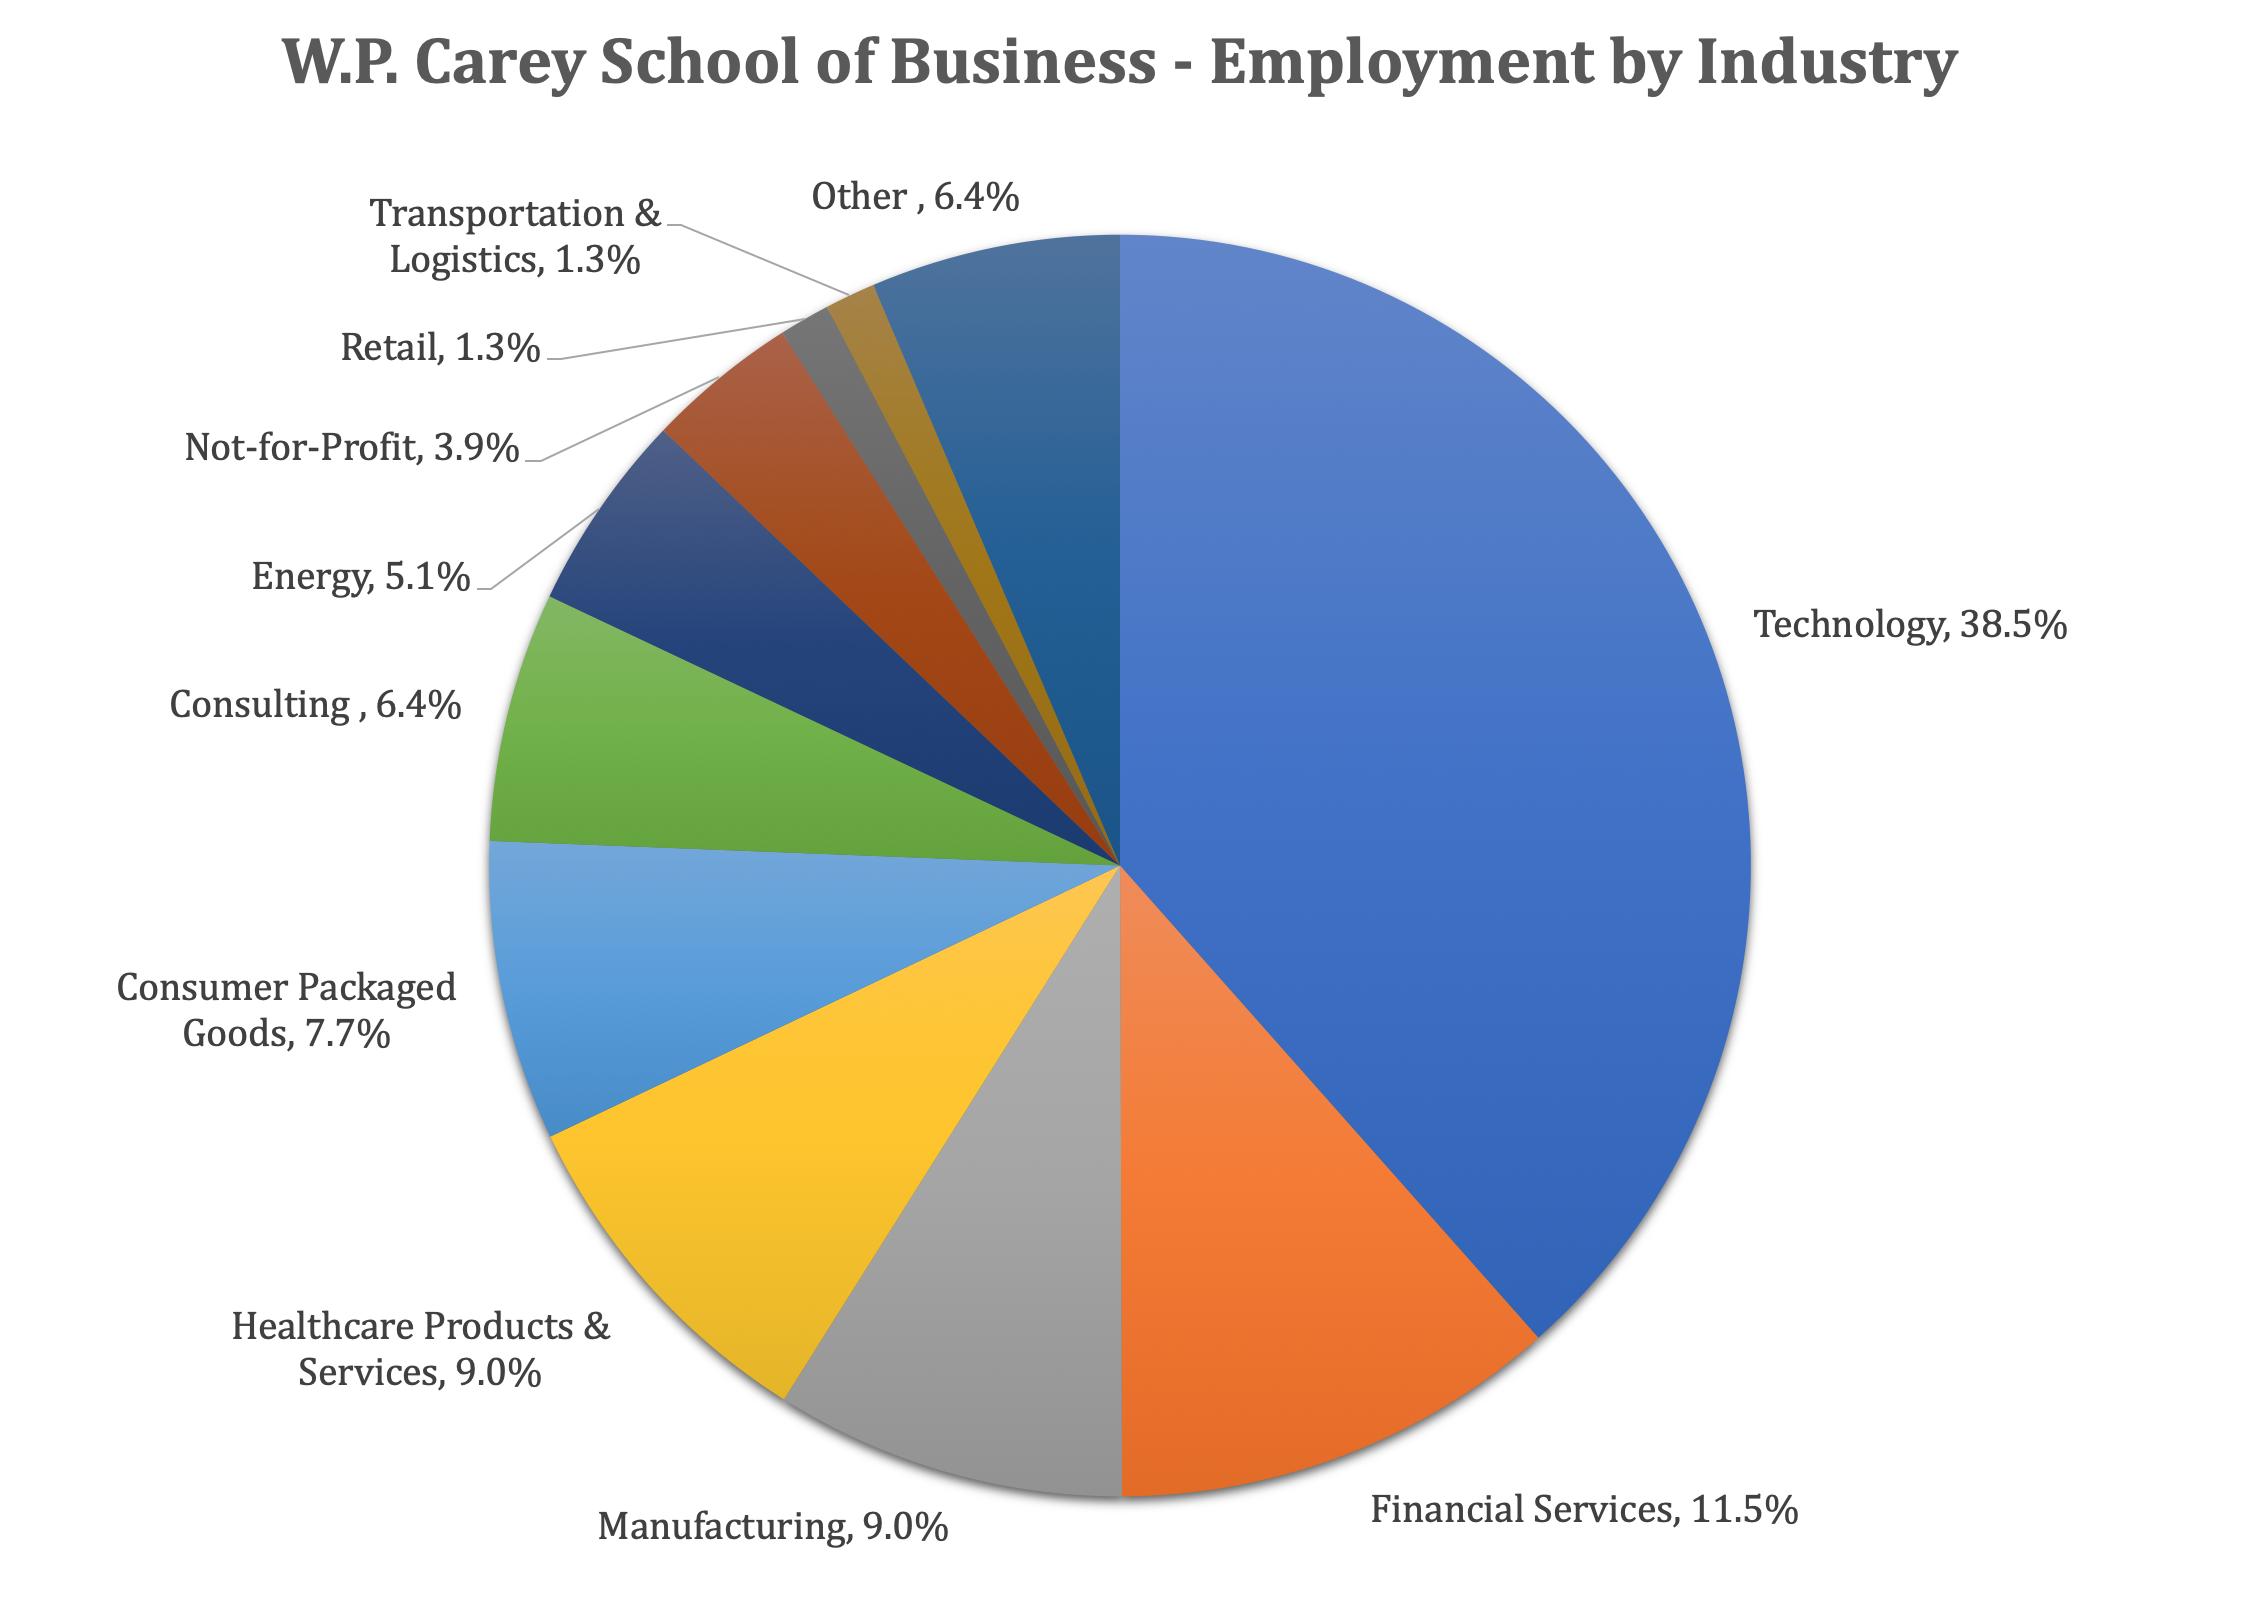 ASU MBA Program - W.P. Carey School of Business - Employment by Industry